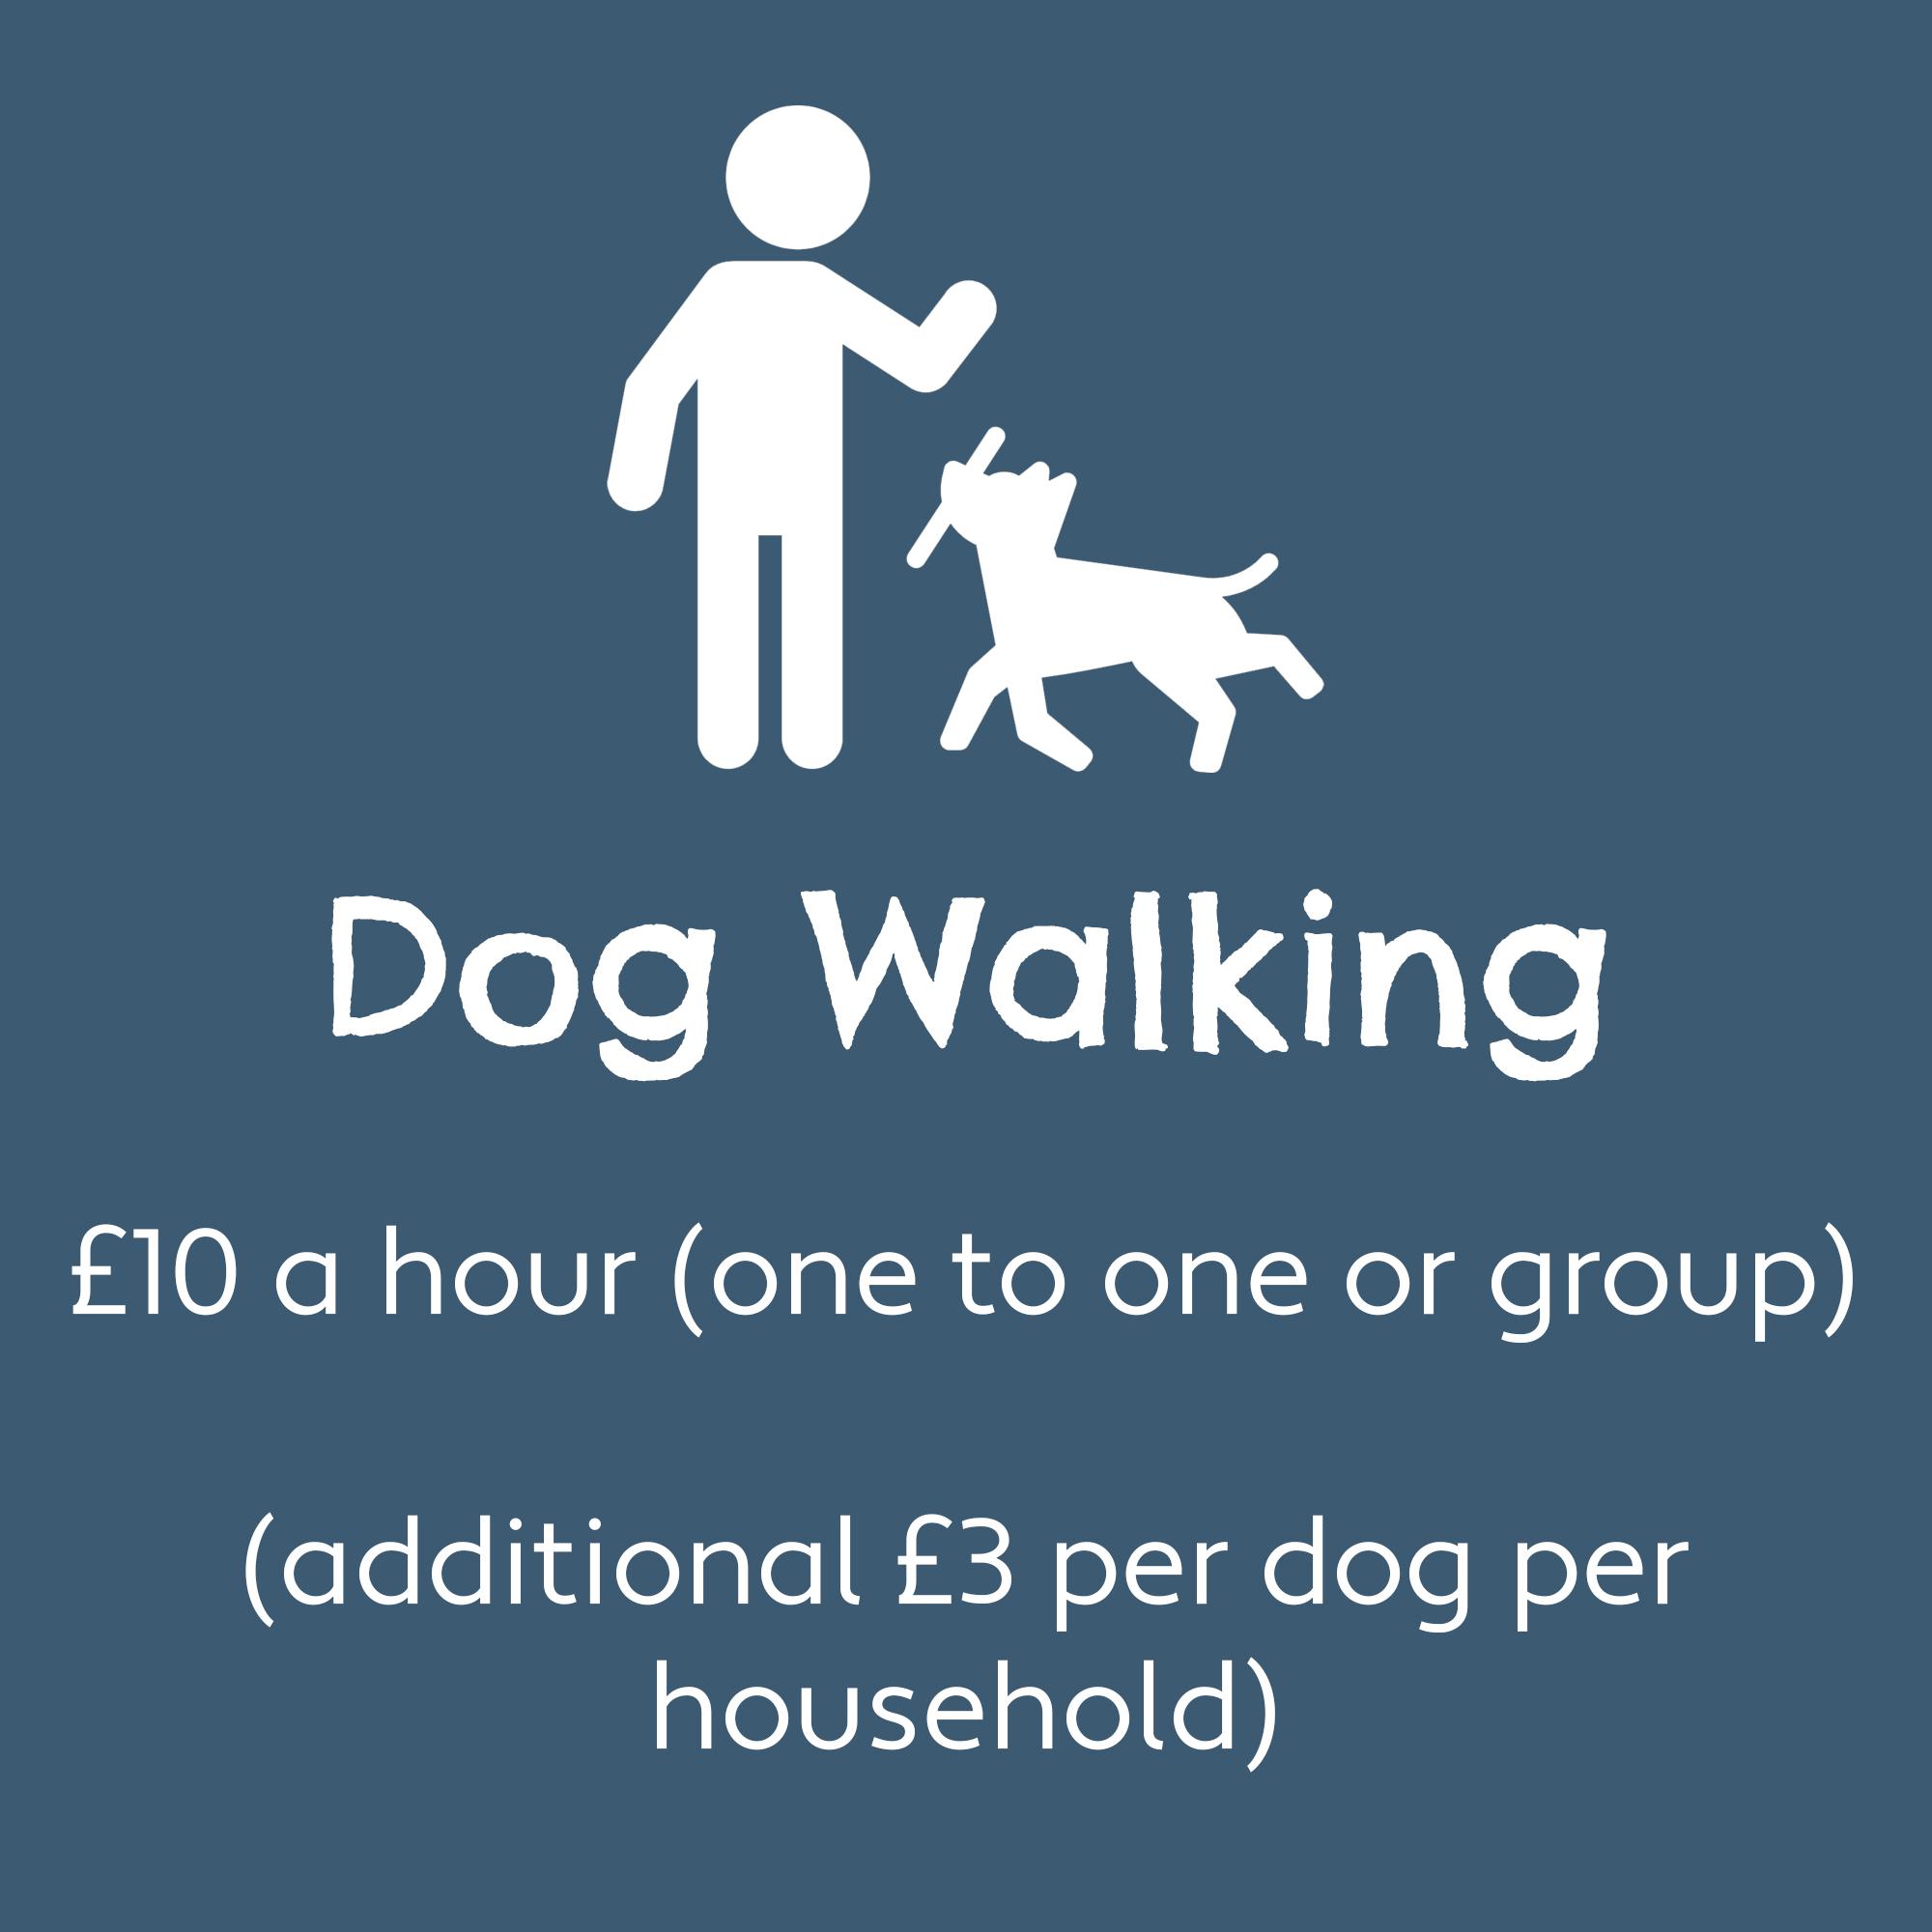 dogwalkingprices.jpg